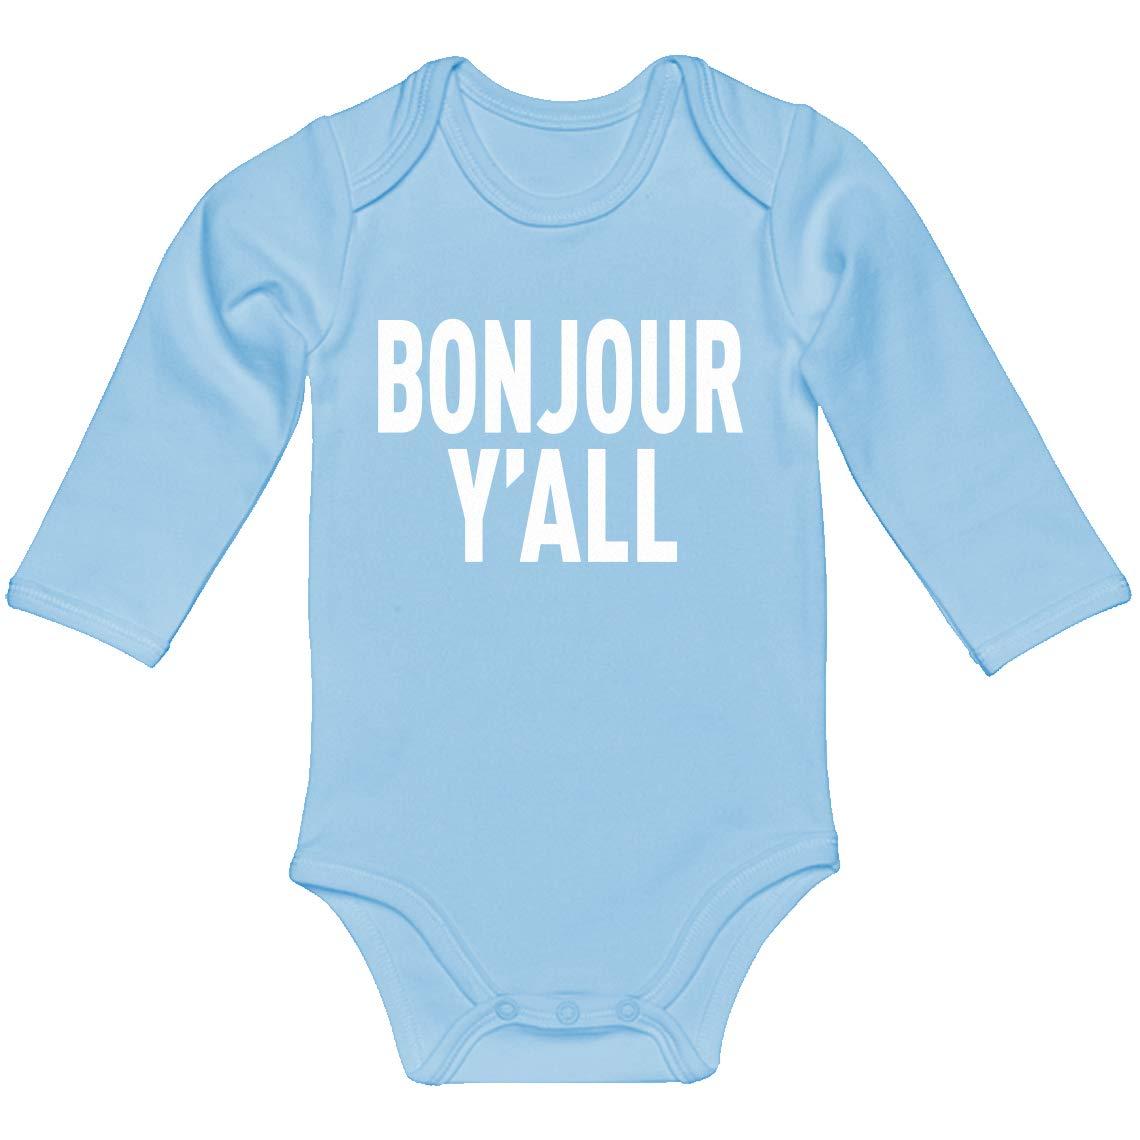 Baby Romper Bonjour Yall 100/% Cotton Long Sleeve Infant Bodysuit